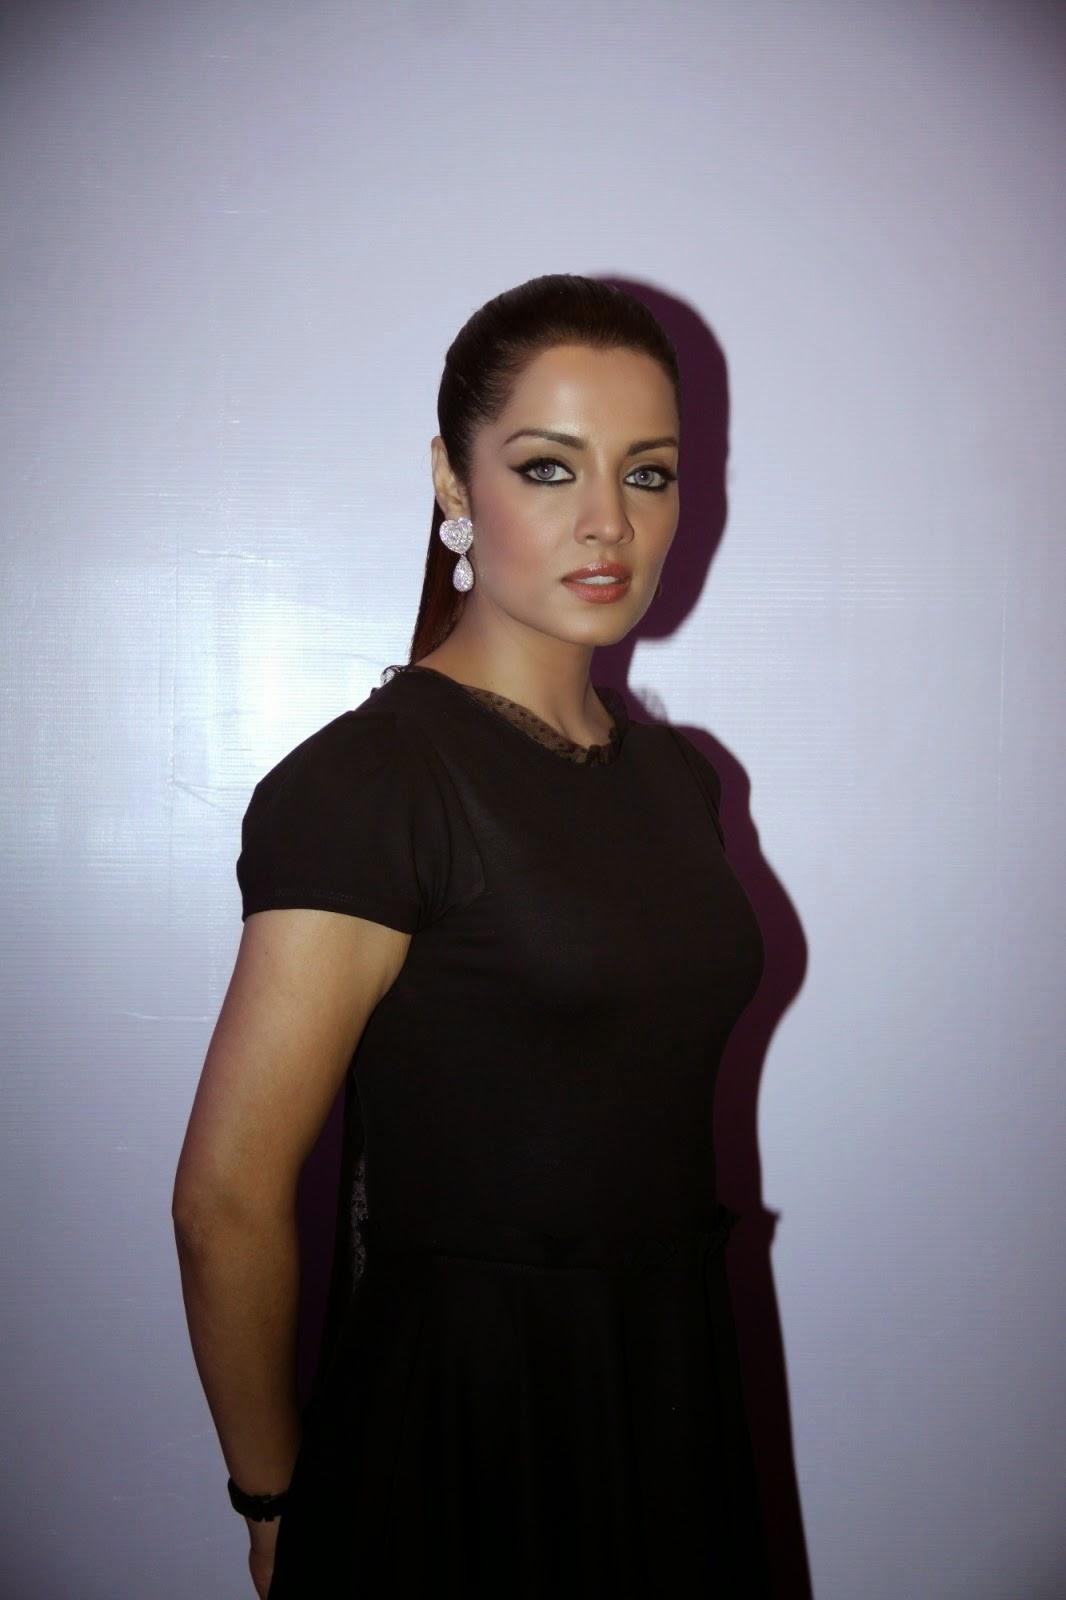 Celina Jaitley Event Imran Khan Launched Debut Music Album